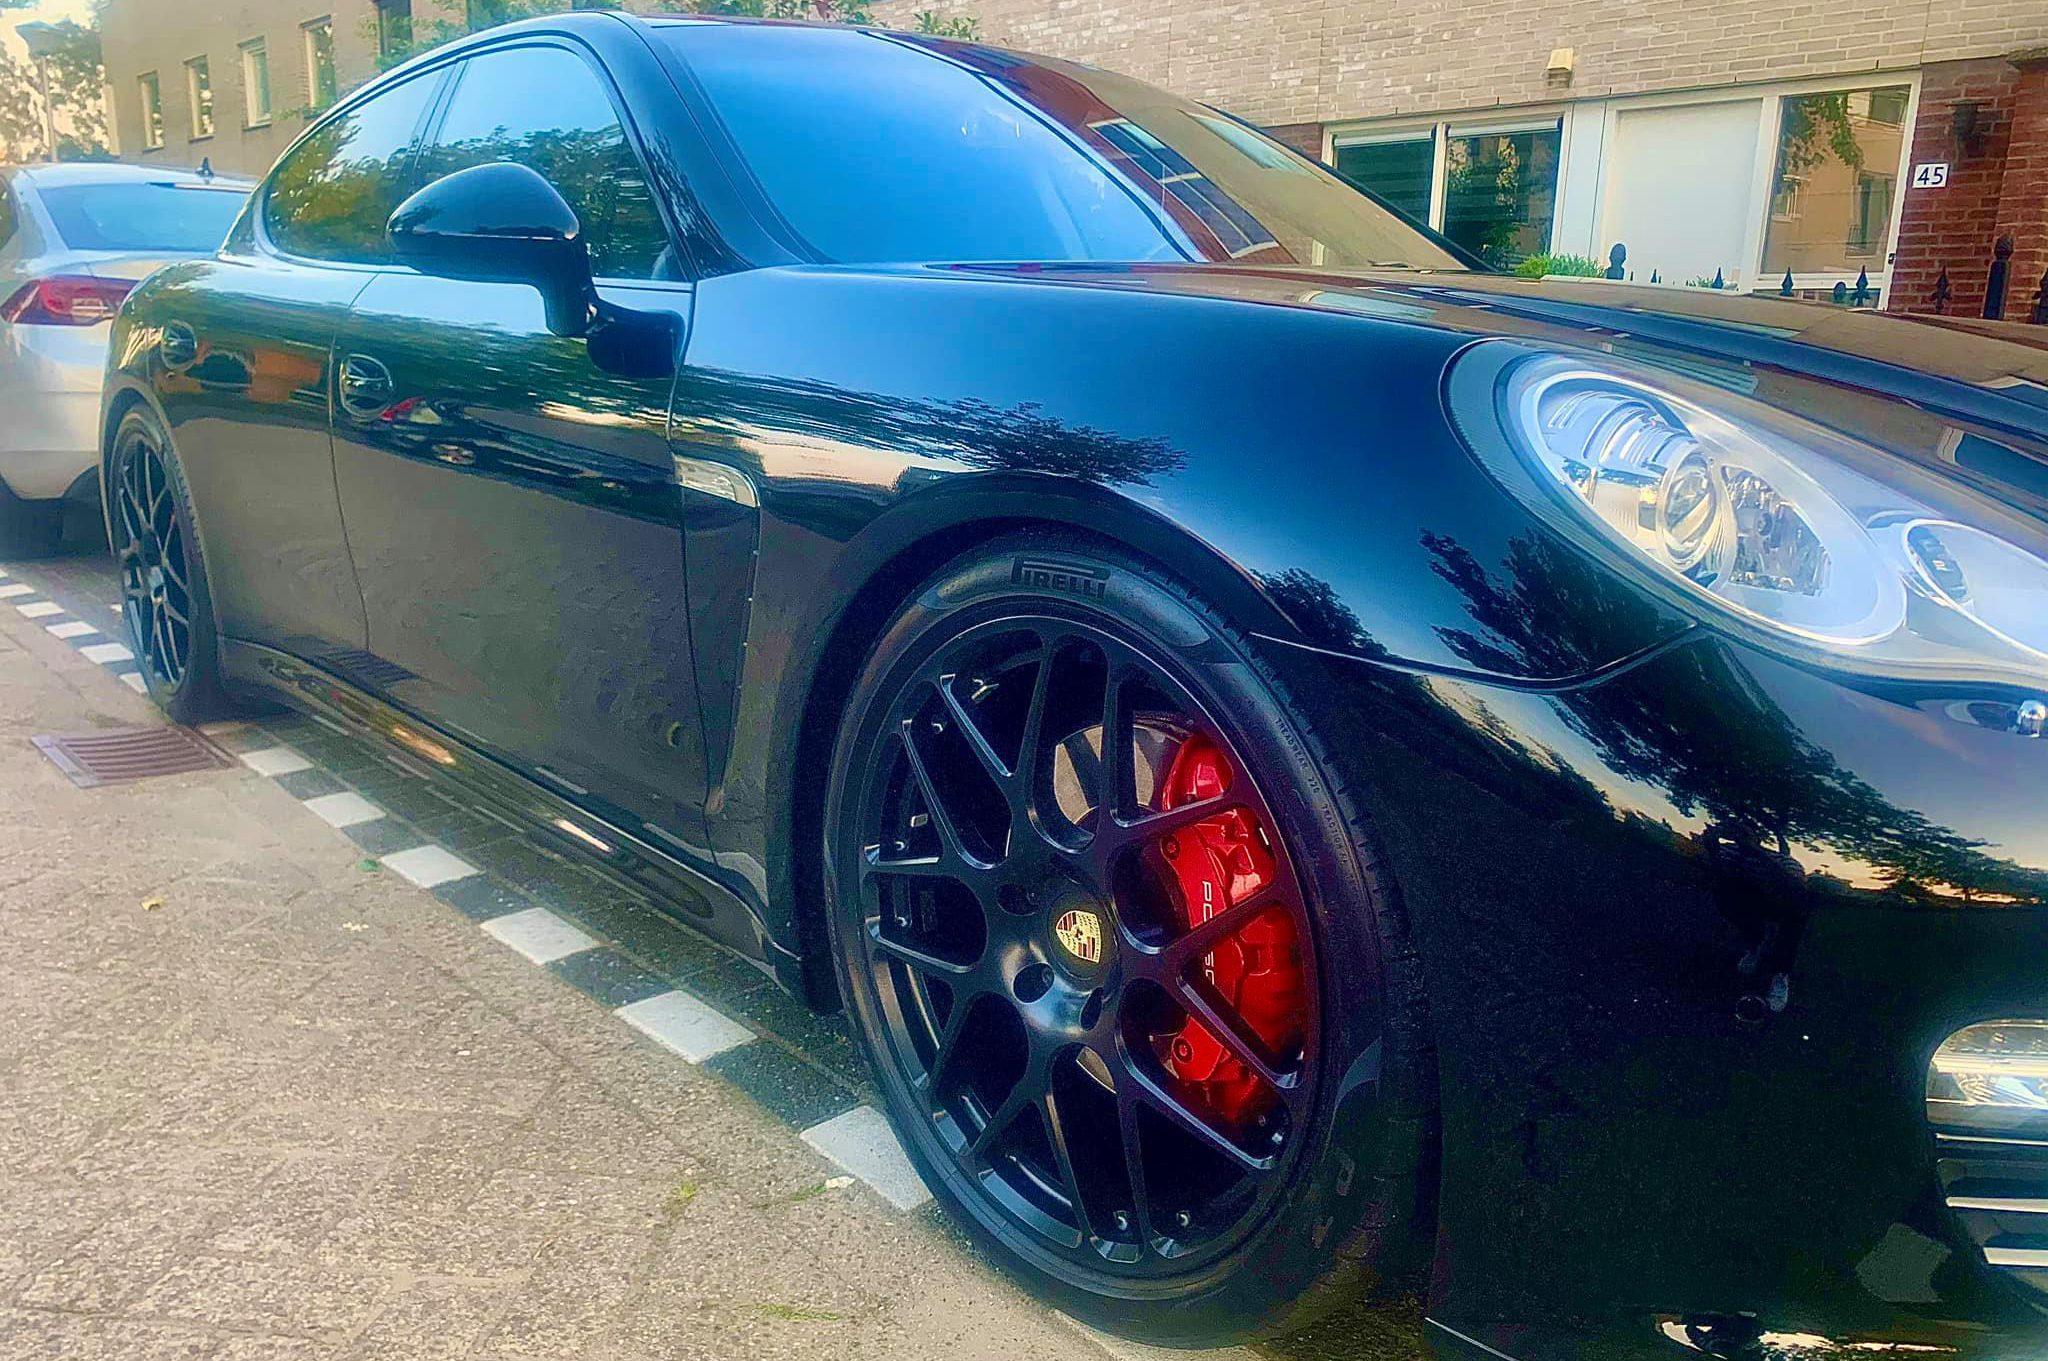 Zeer nette zwarte Porsche Panamera 4S 4.8L V8 400pk luchtvering 21inch zwart/wit interieur